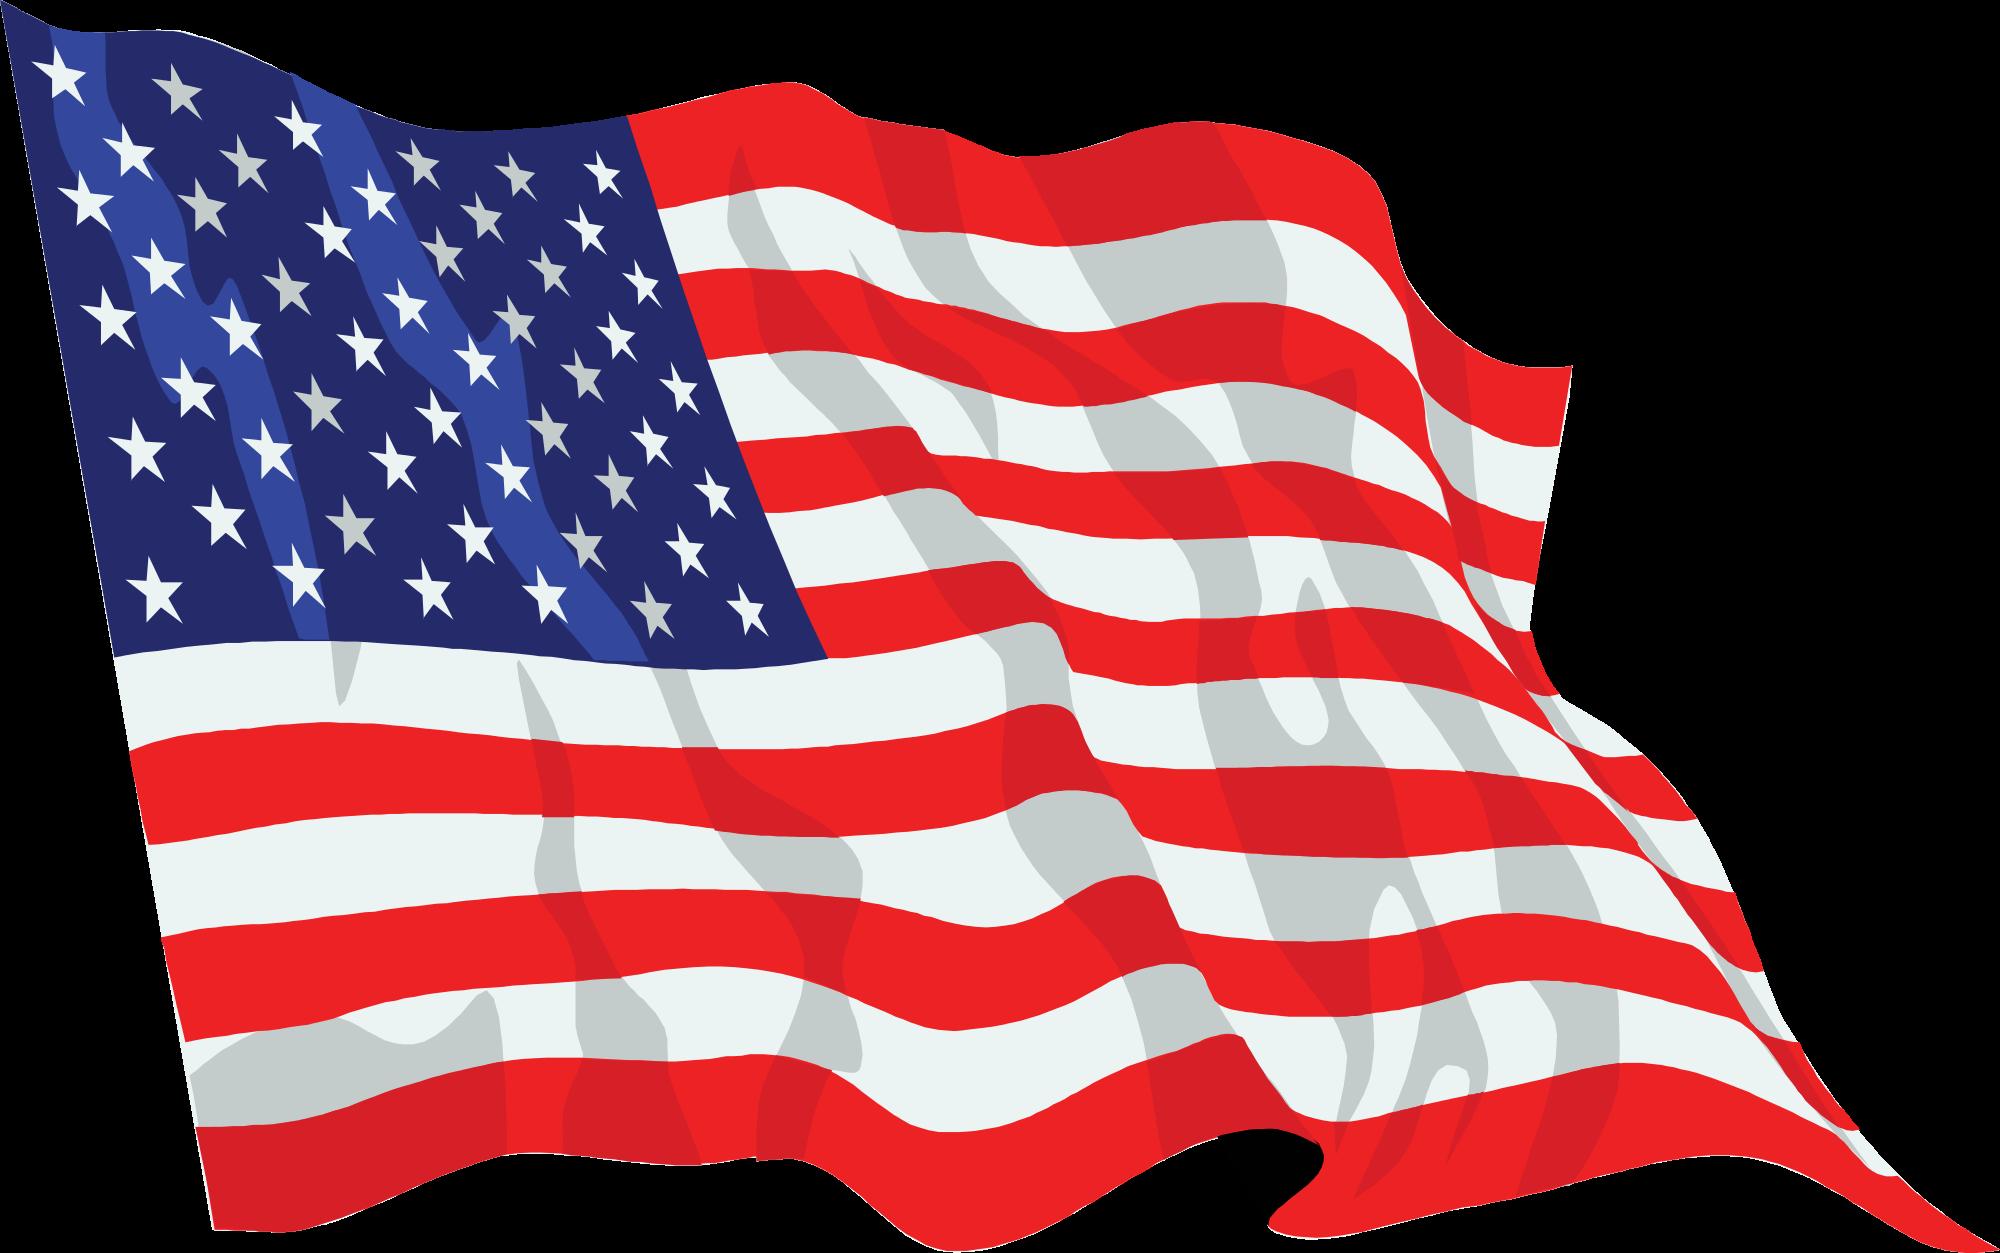 United states flag clip art clip art transparent File:United States flag waving icon.svg - Wikimedia Commons clip art transparent